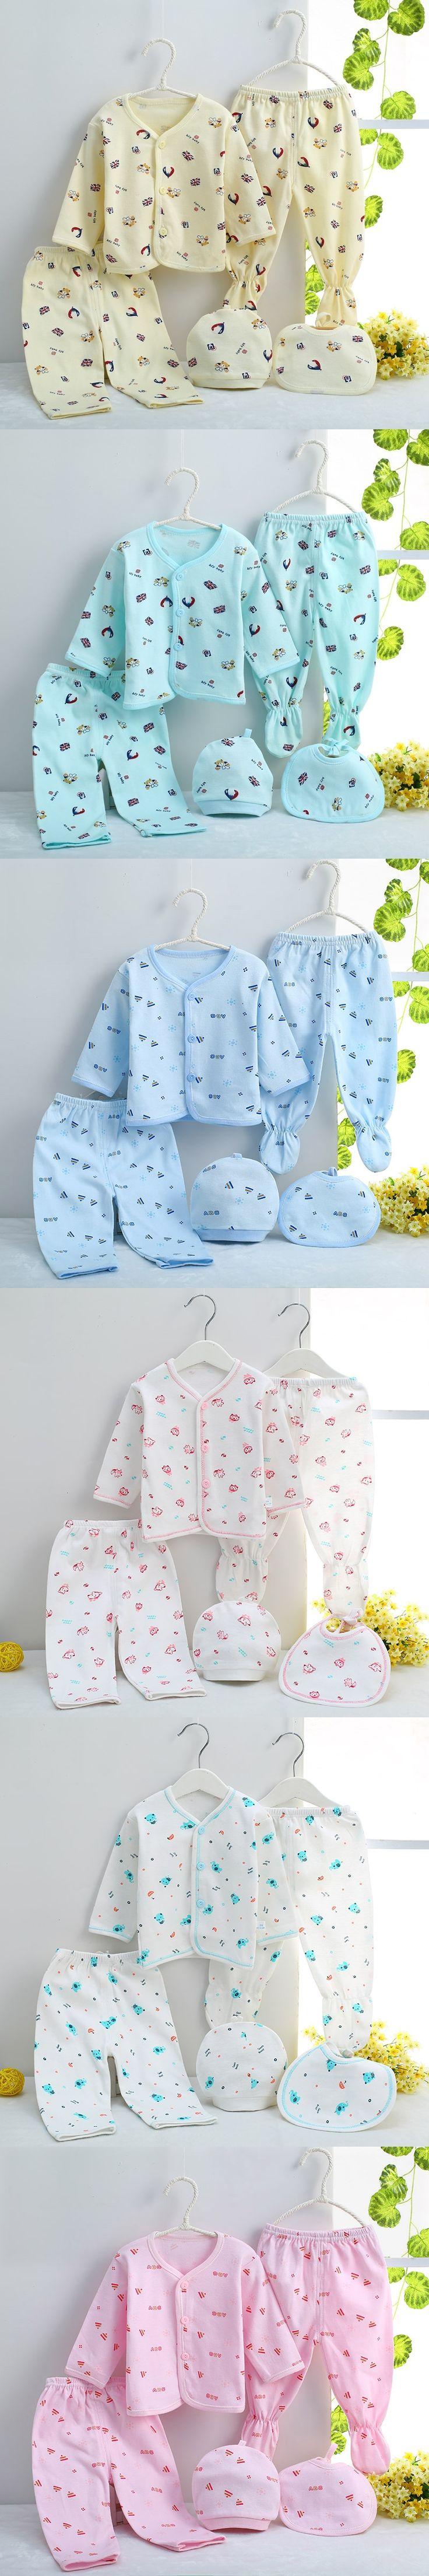 (5pcs/set)Newborn Baby 0-3M Clothing Set Cheap Baby Boy/Girl Clothes 100% Cotton high quality Cartoon Underwear